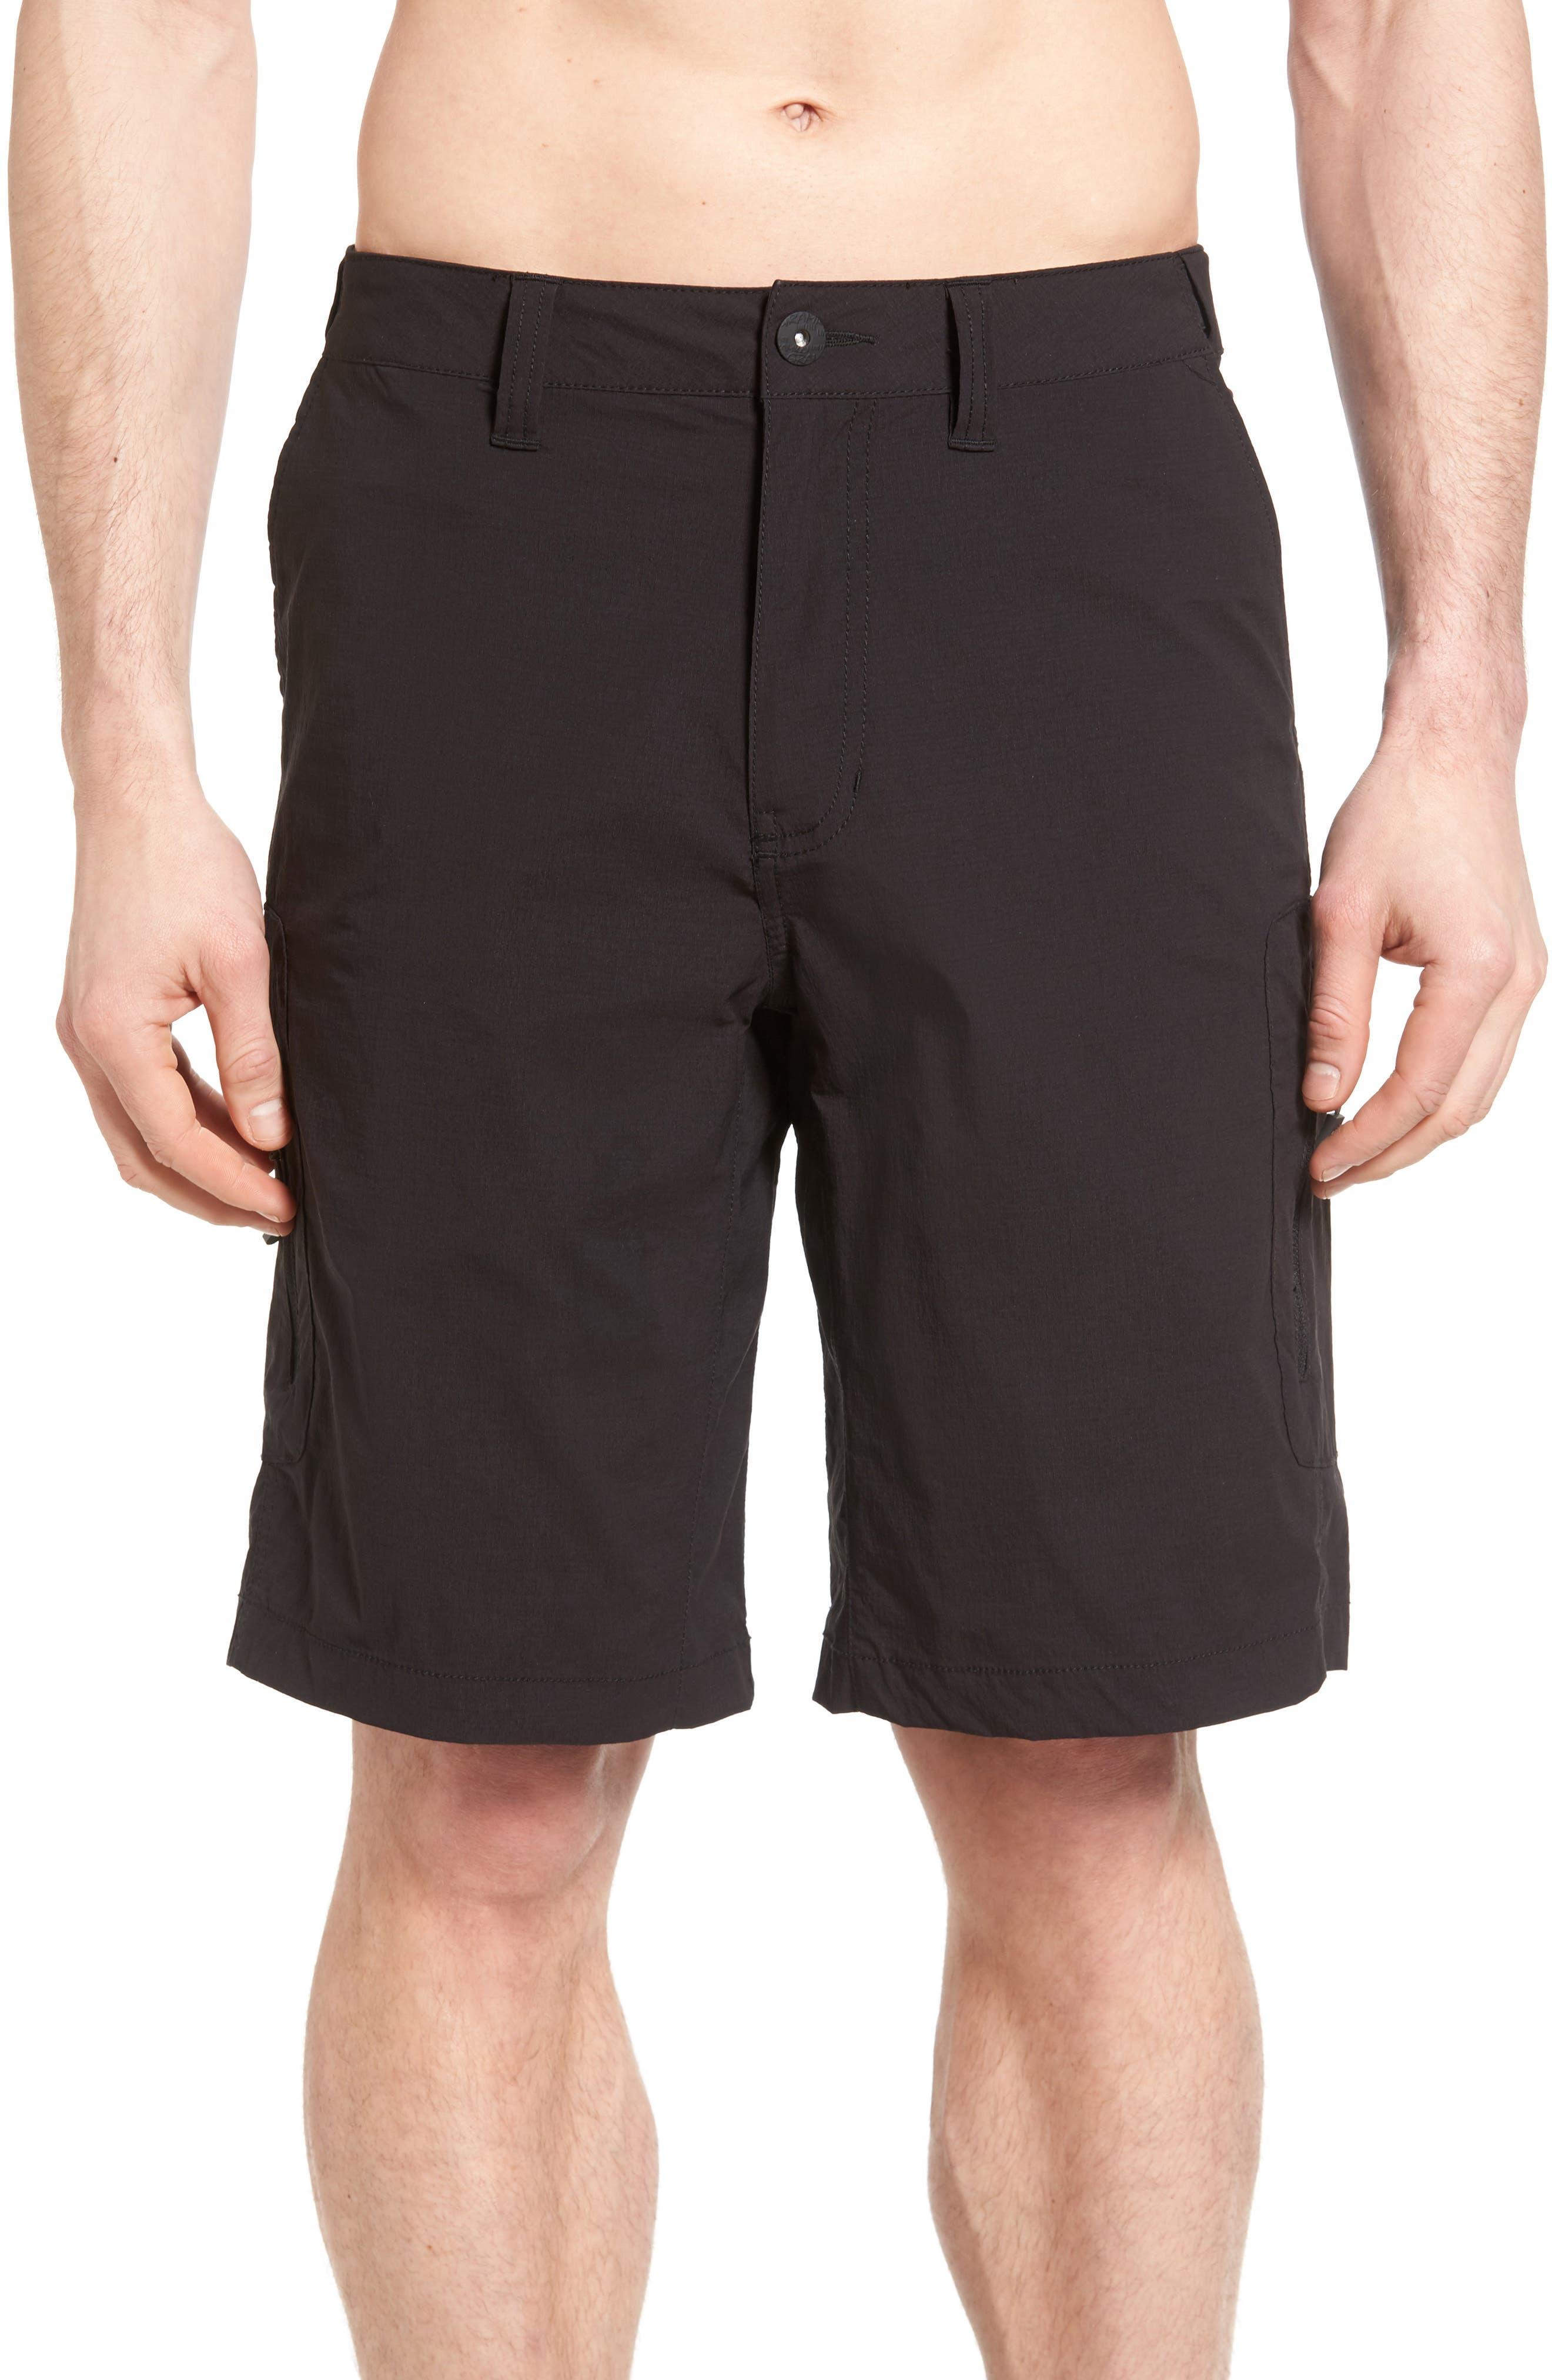 Rough & Tumble Hiking Shorts,                             Main thumbnail 1, color,                             002